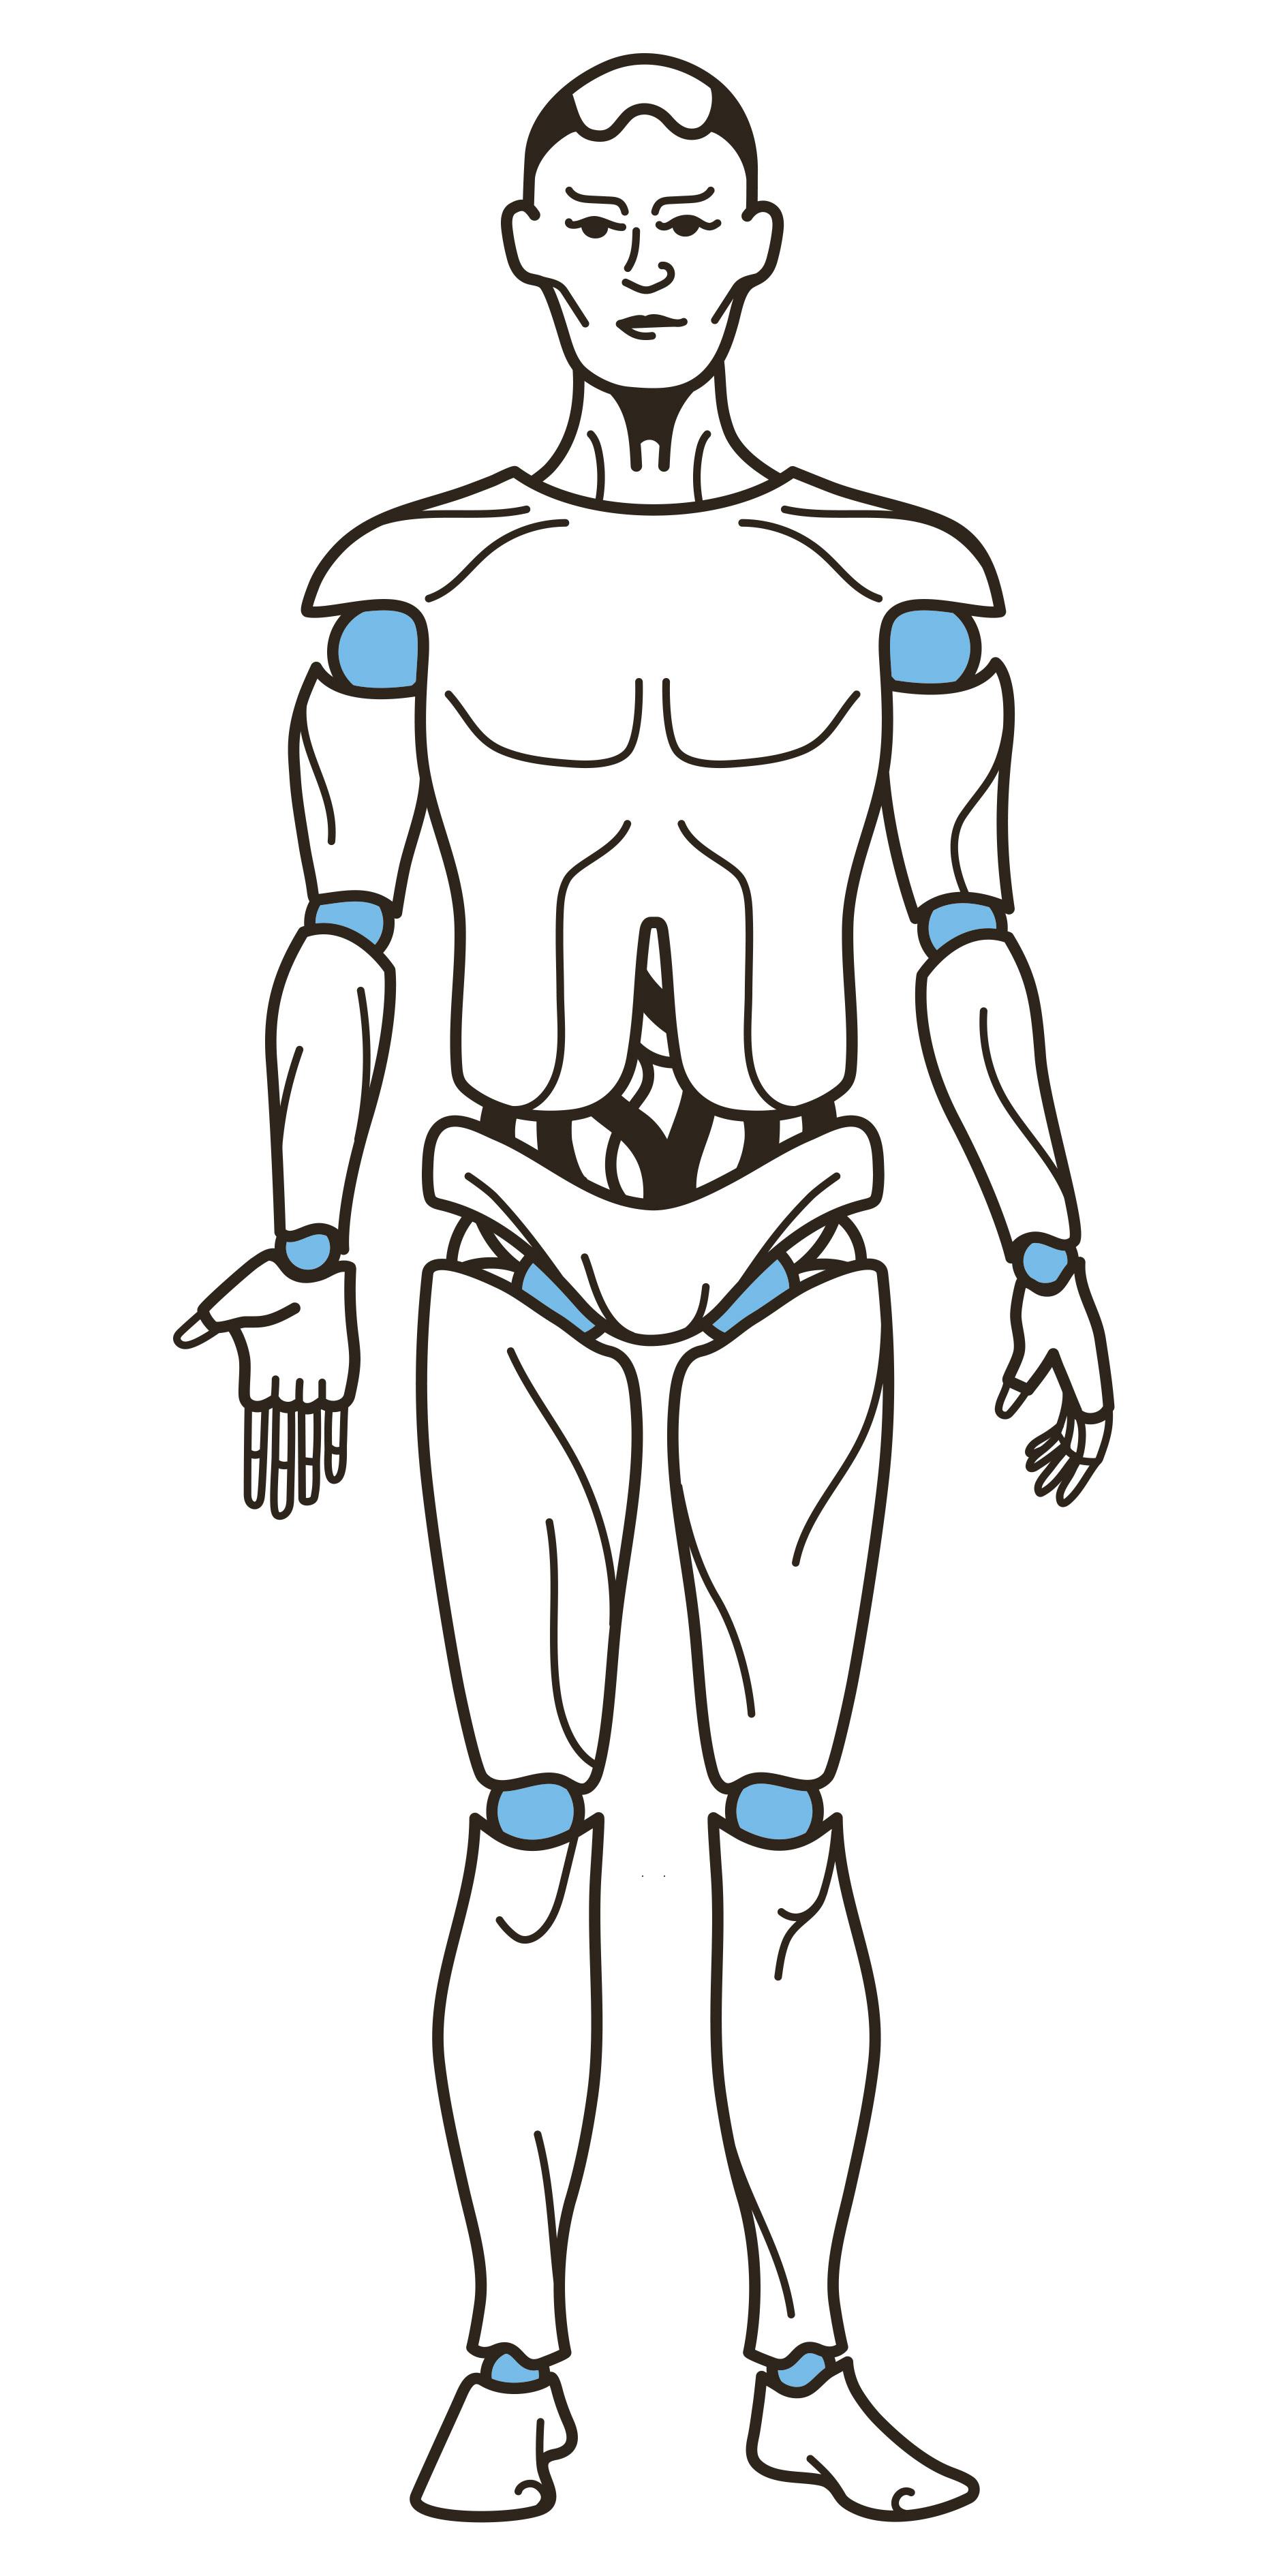 danielabracco.ROBOT-explicit